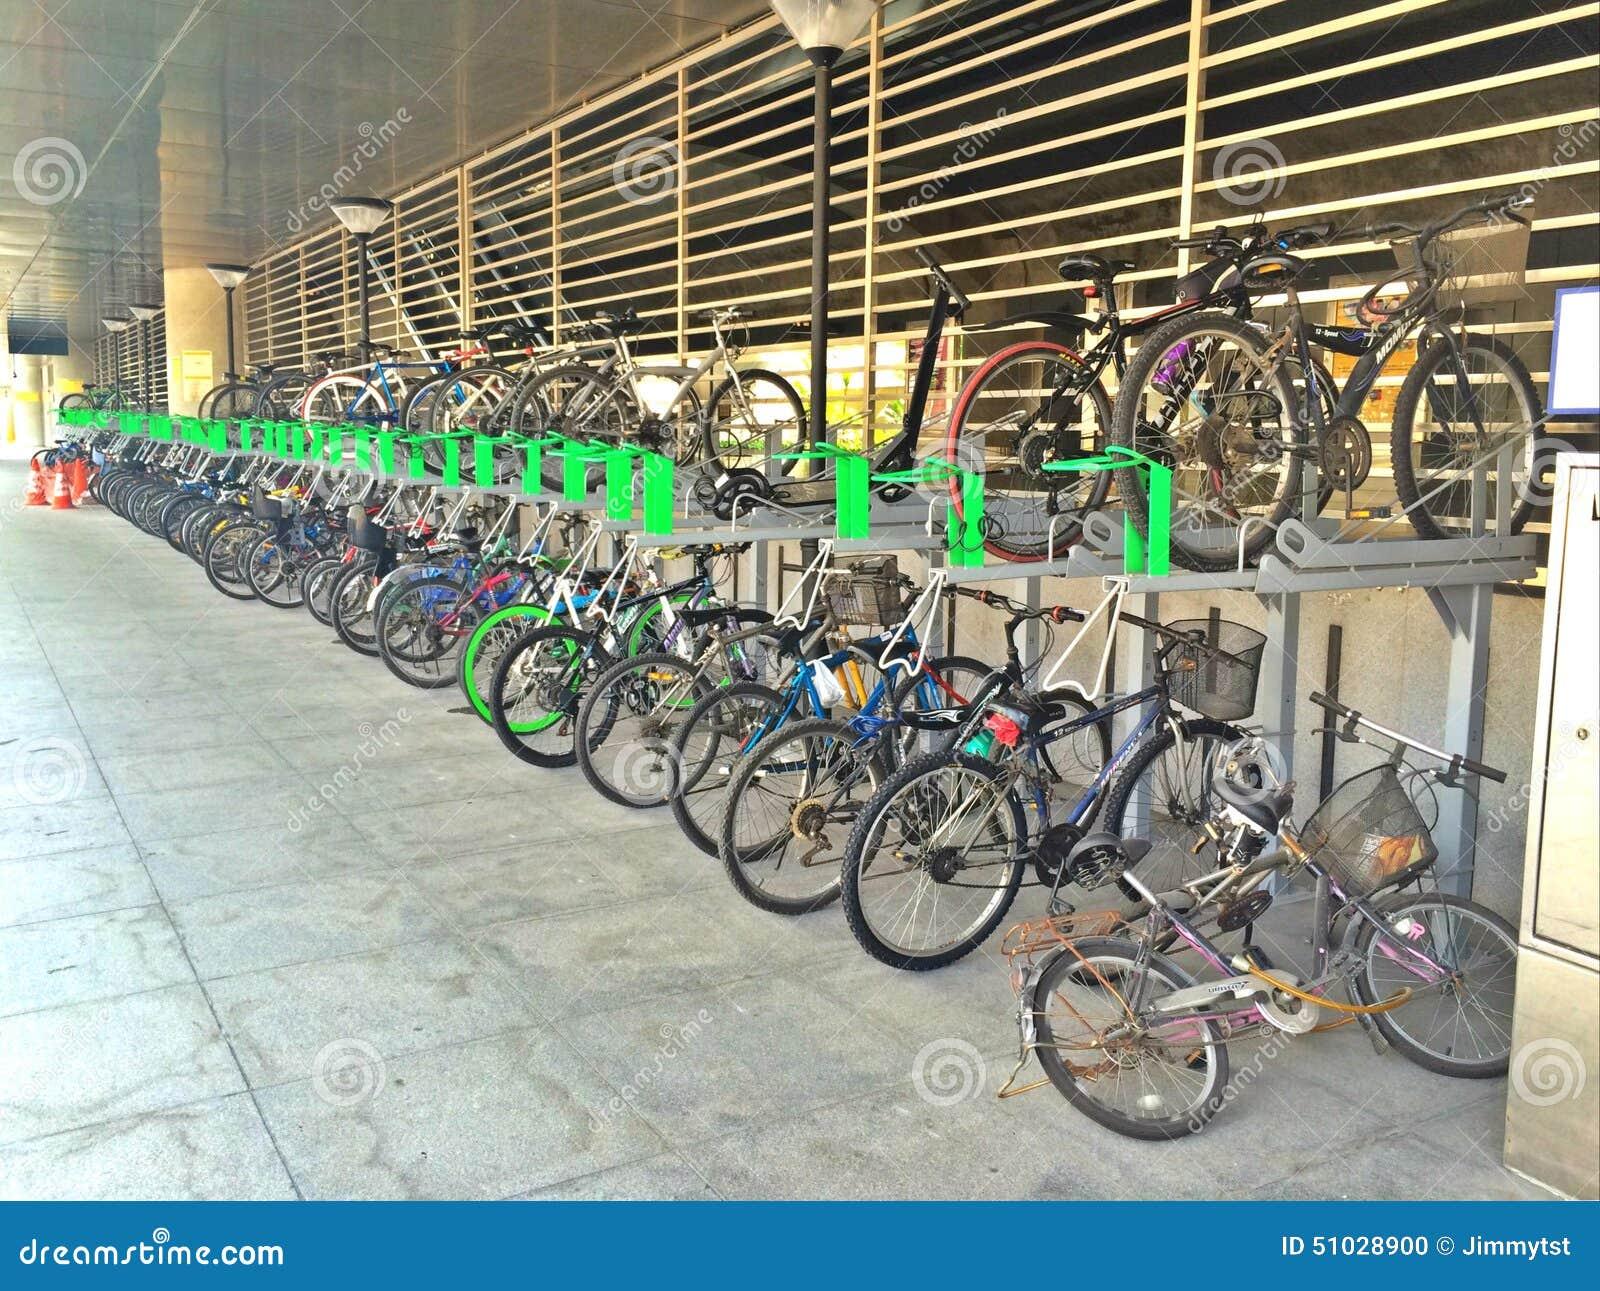 Editorial Stock Photo 2 Tier Bicycle Racks